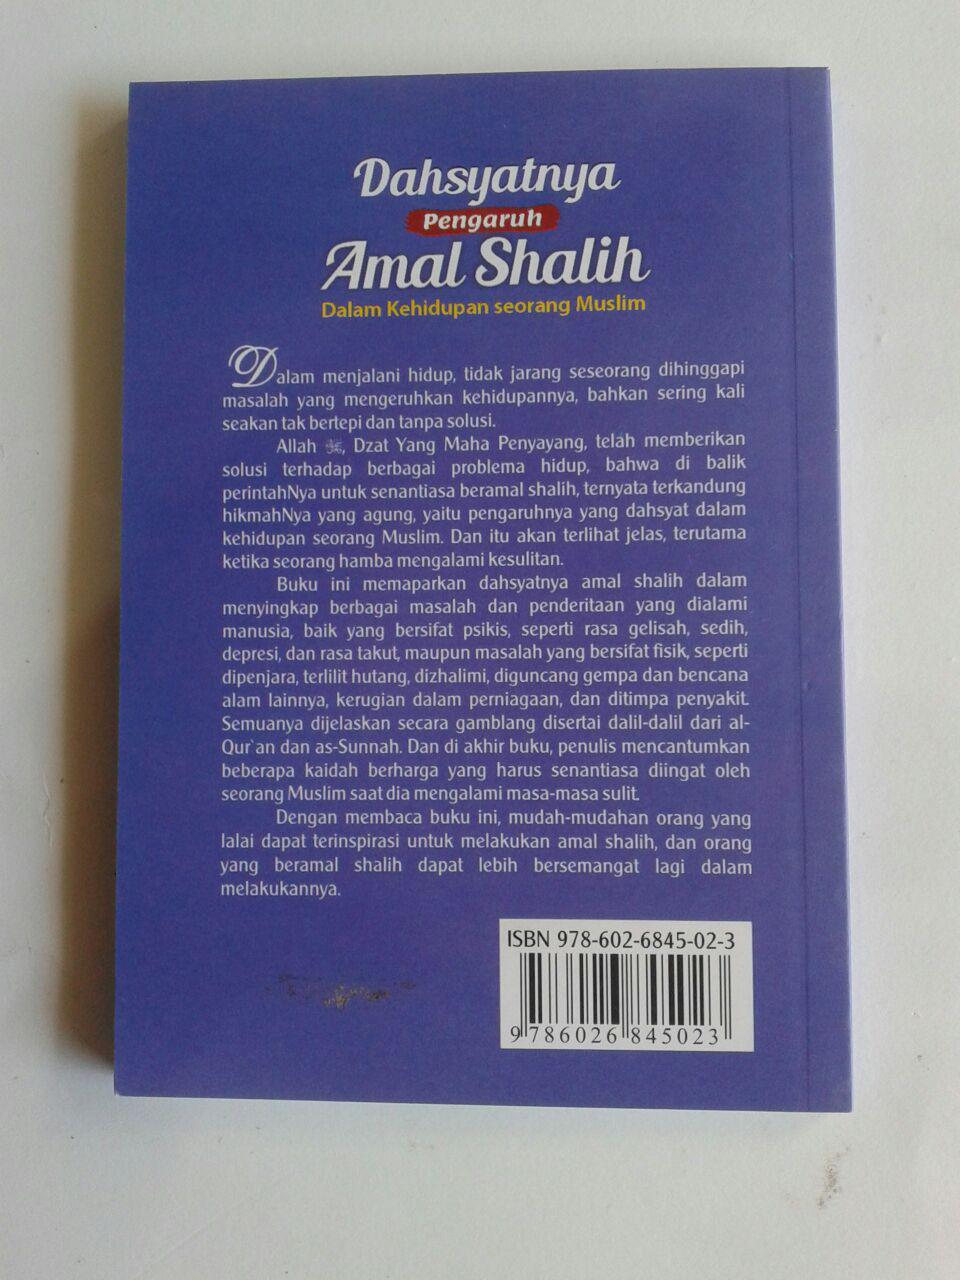 Buku Saku Dahsyatnya Pengaruh Amal Shalih Dalam Kehidupan cover